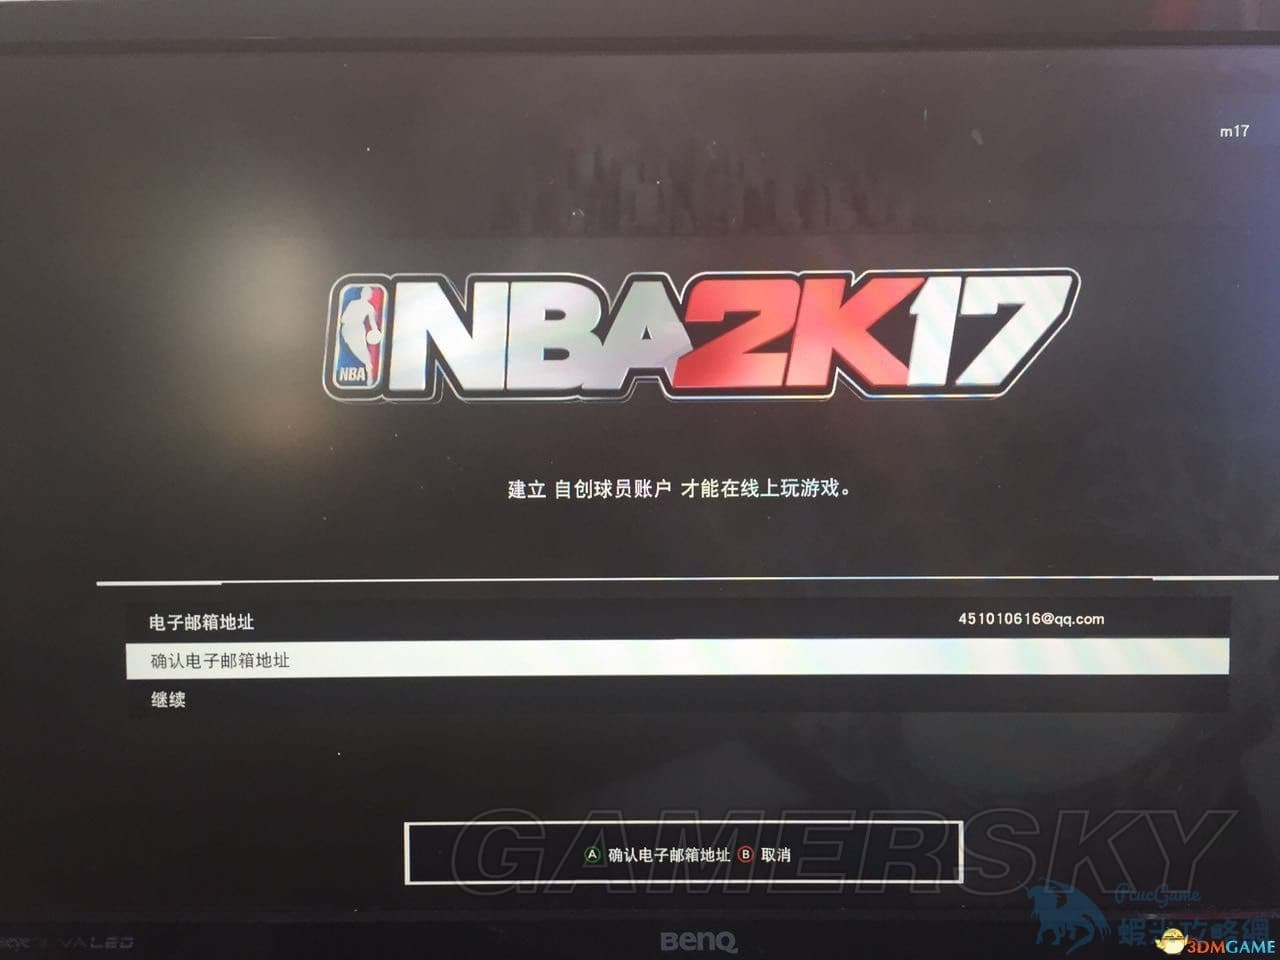 NBA2K17 常見問題解決方法匯總 閃退卡頓及連不上伺服器解決方法